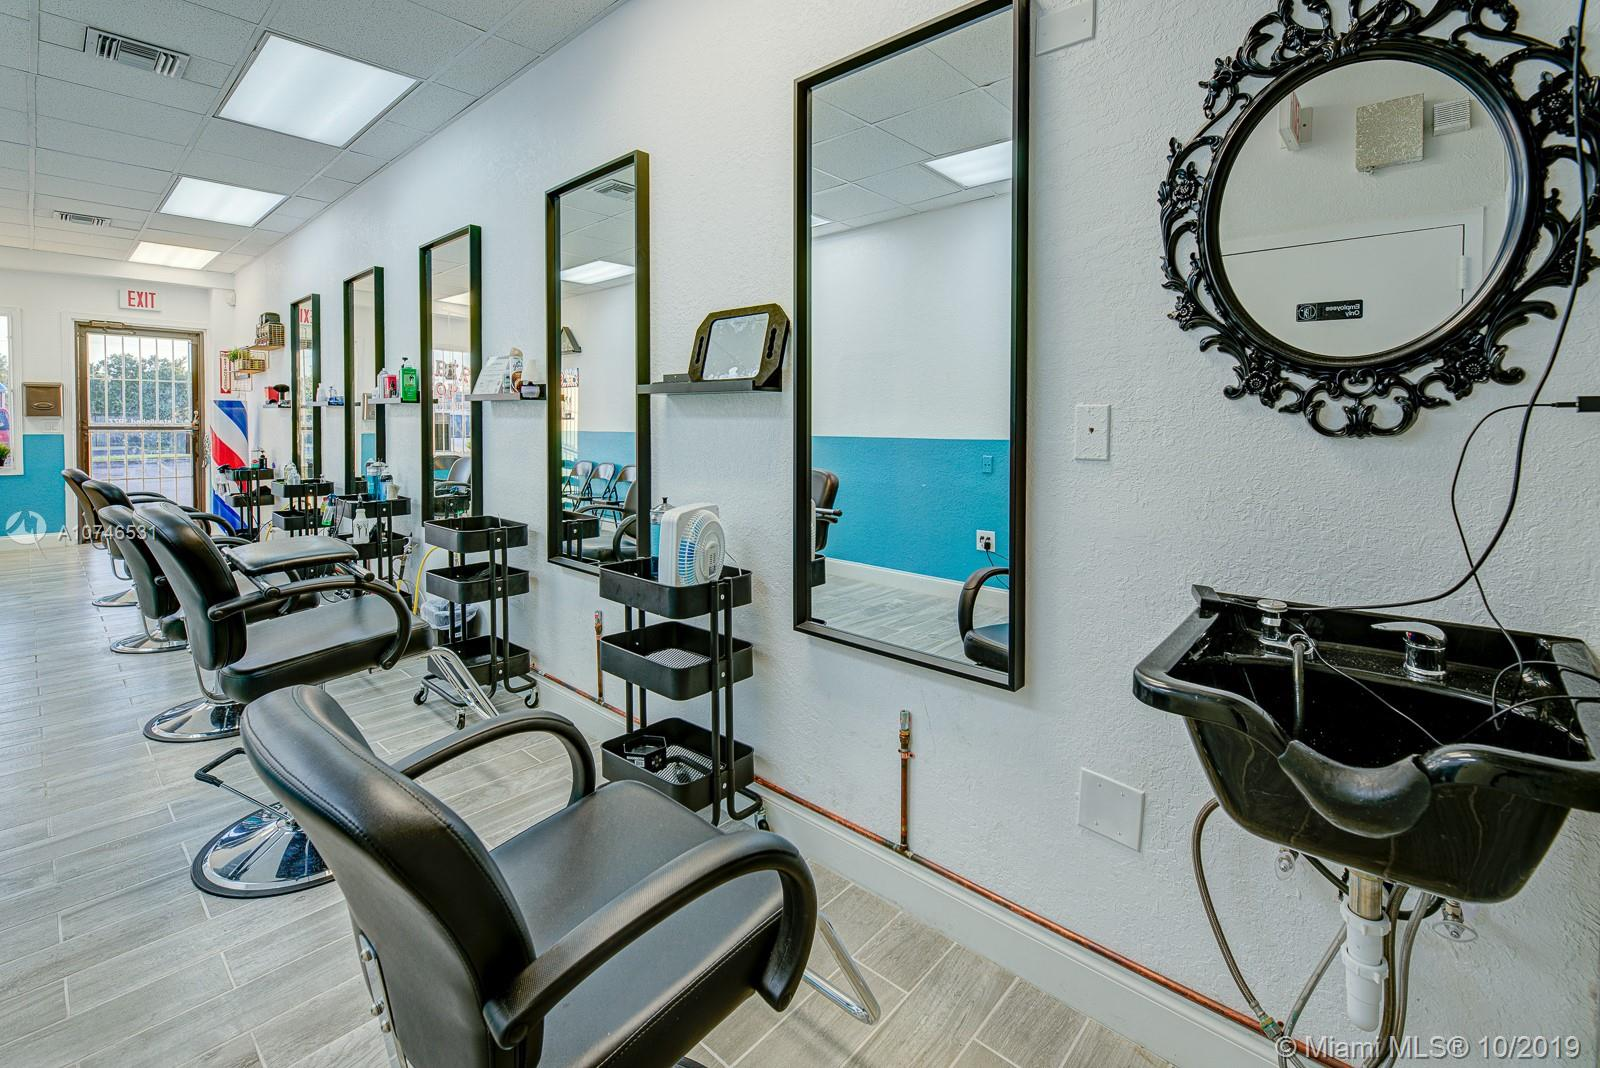 Barbershop on US-1 Property Photo - Miami, FL real estate listing